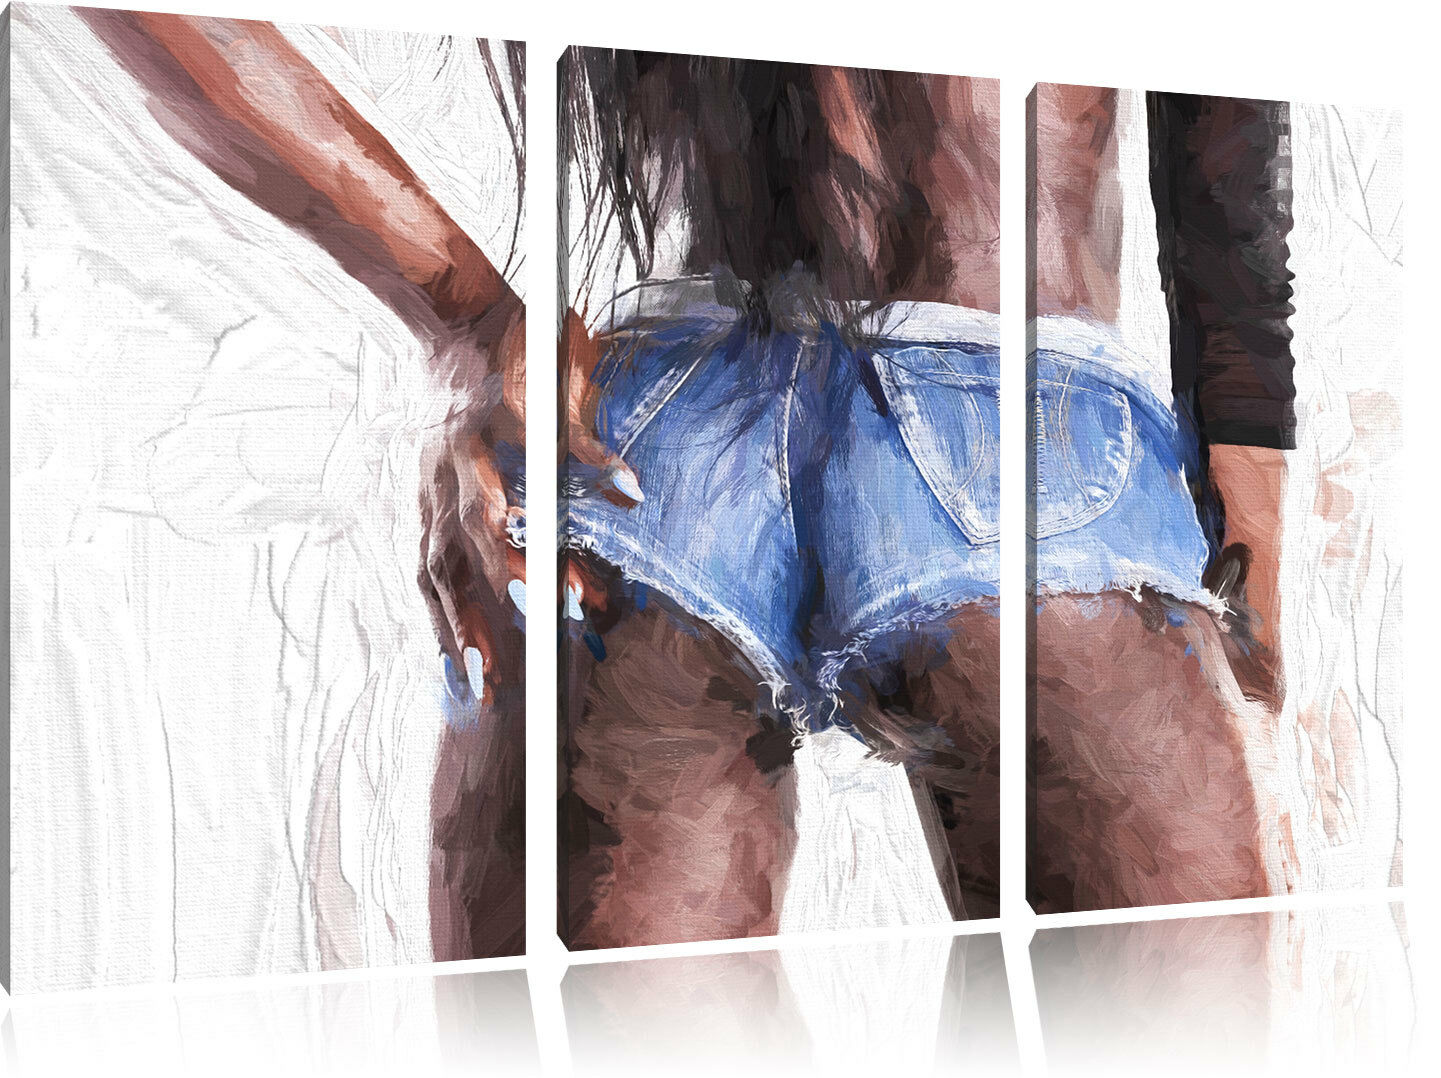 Reizvolle rassische Frau Kunst Pinsel Effekt 3-Teiler Leinwandbild Wanddeko Kuns